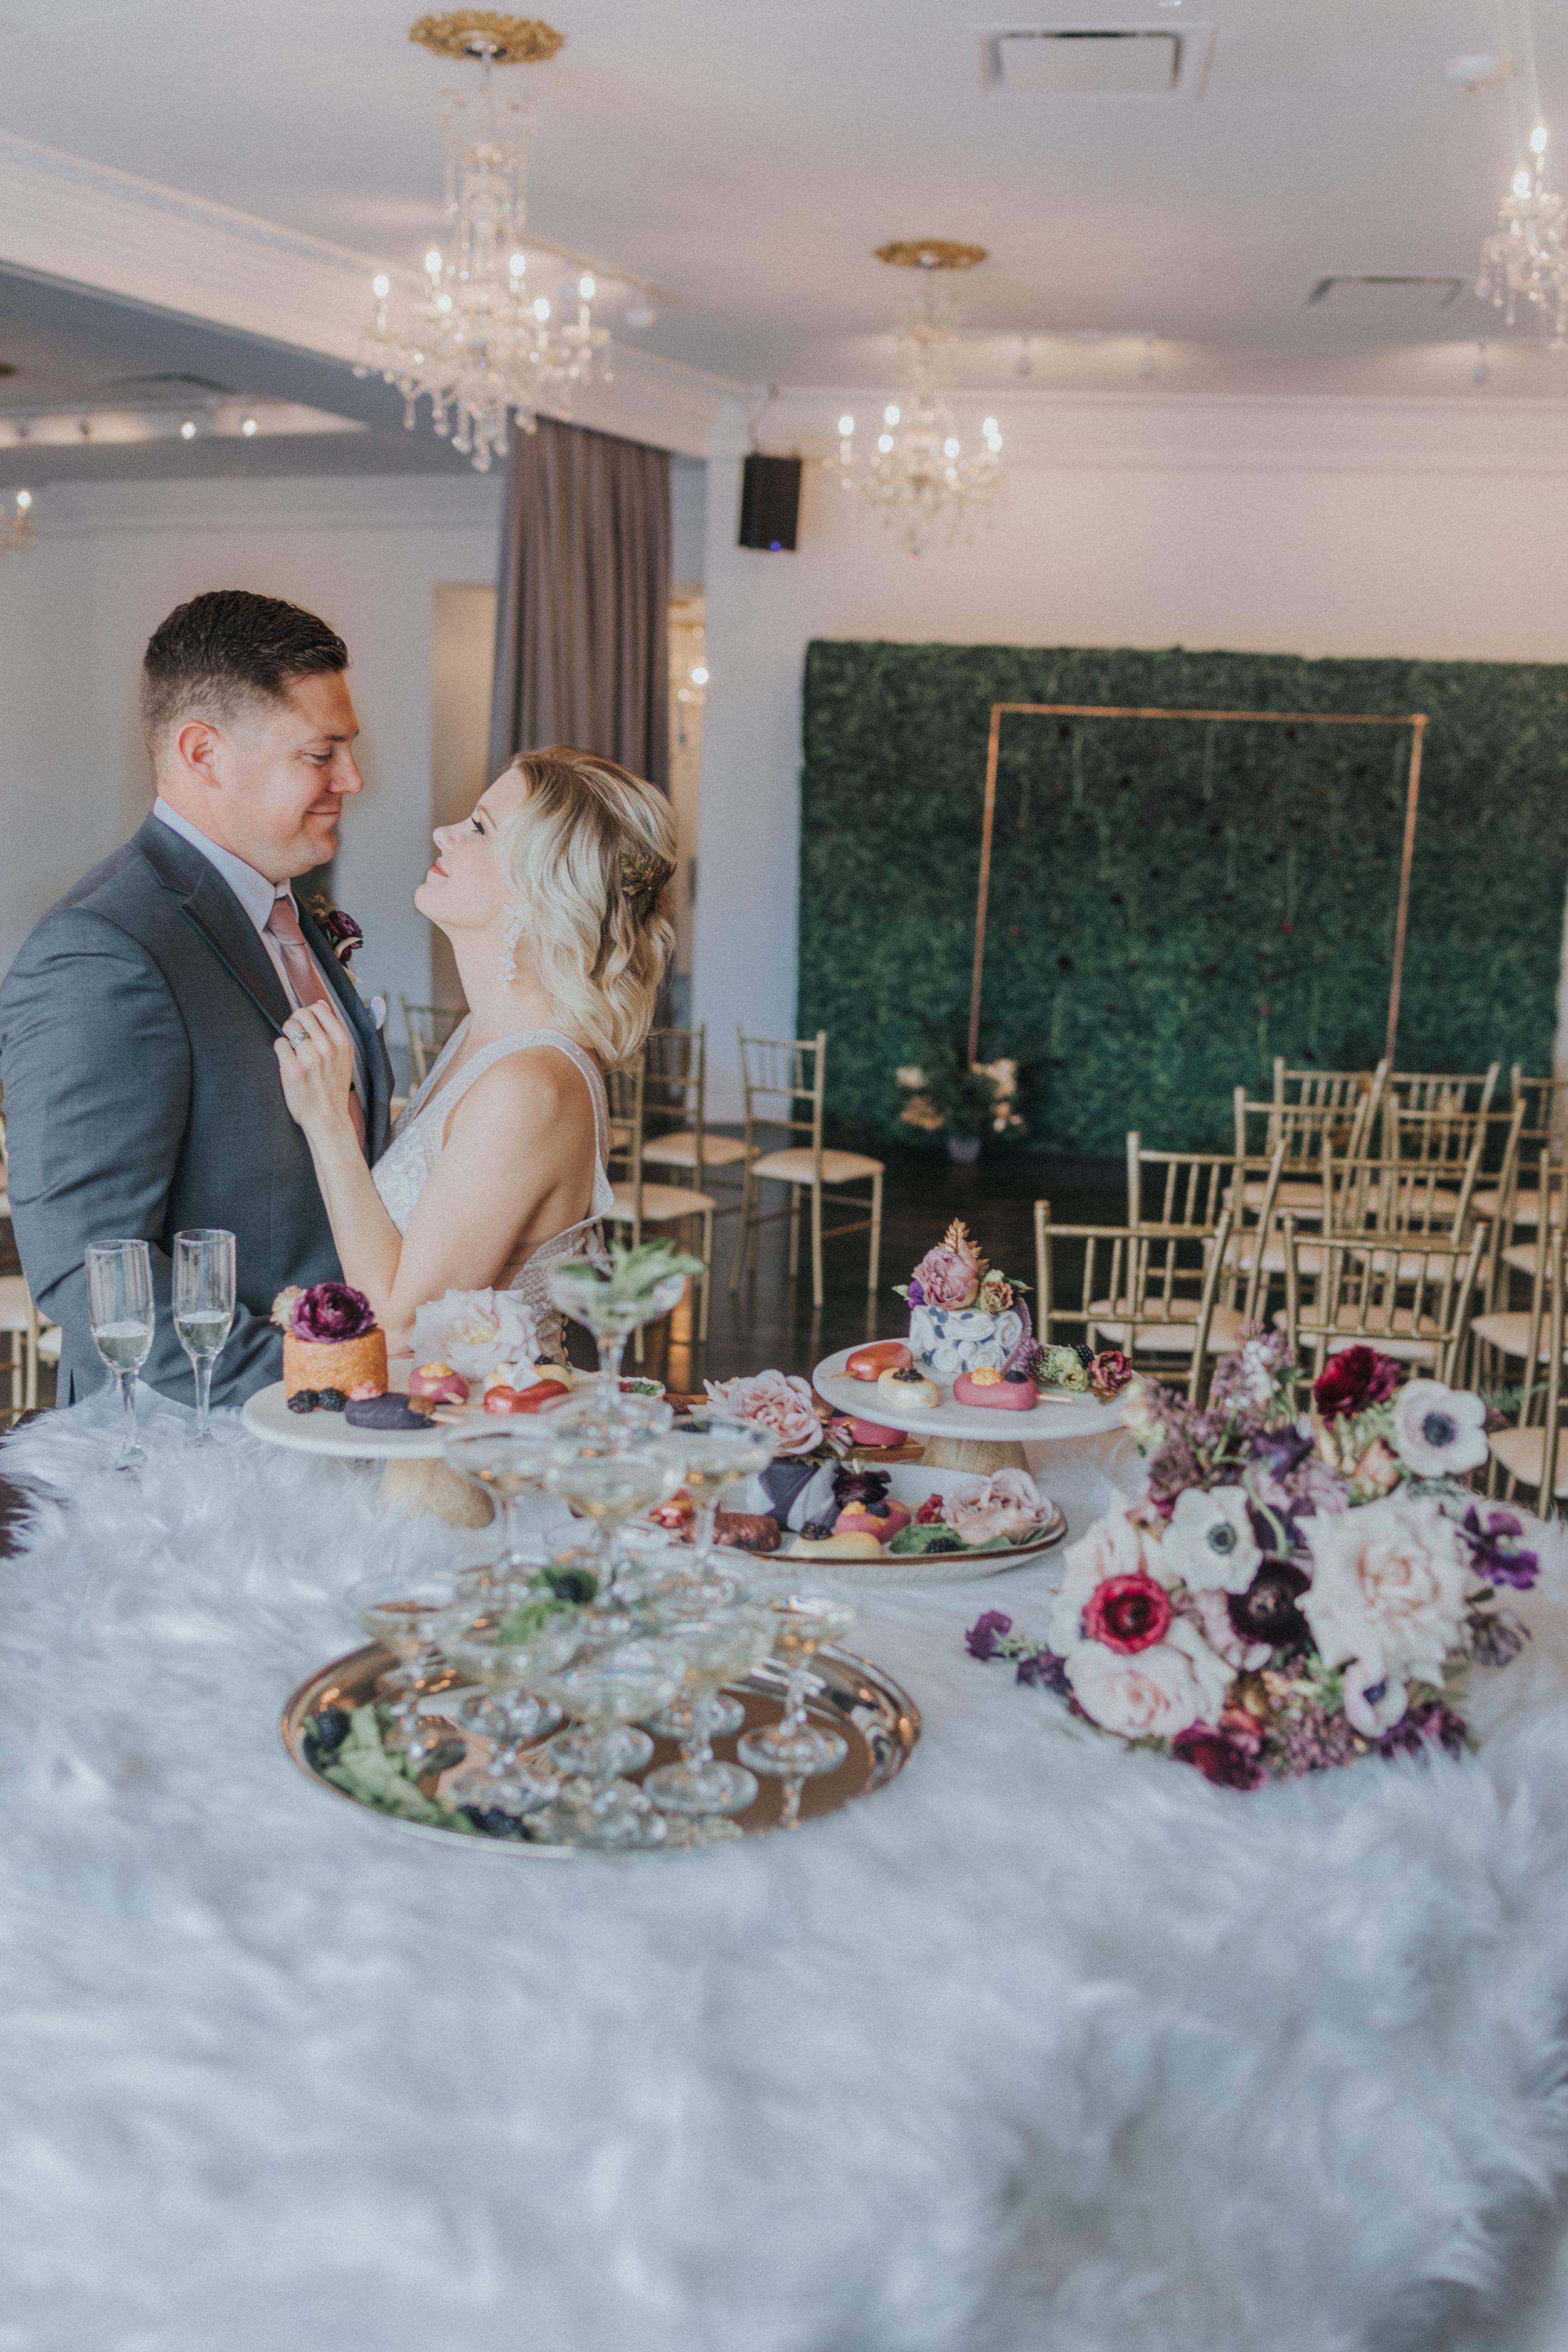 147 tiny-luxe-weddings-omaha-nebraska-midwest-empire-room.jpg